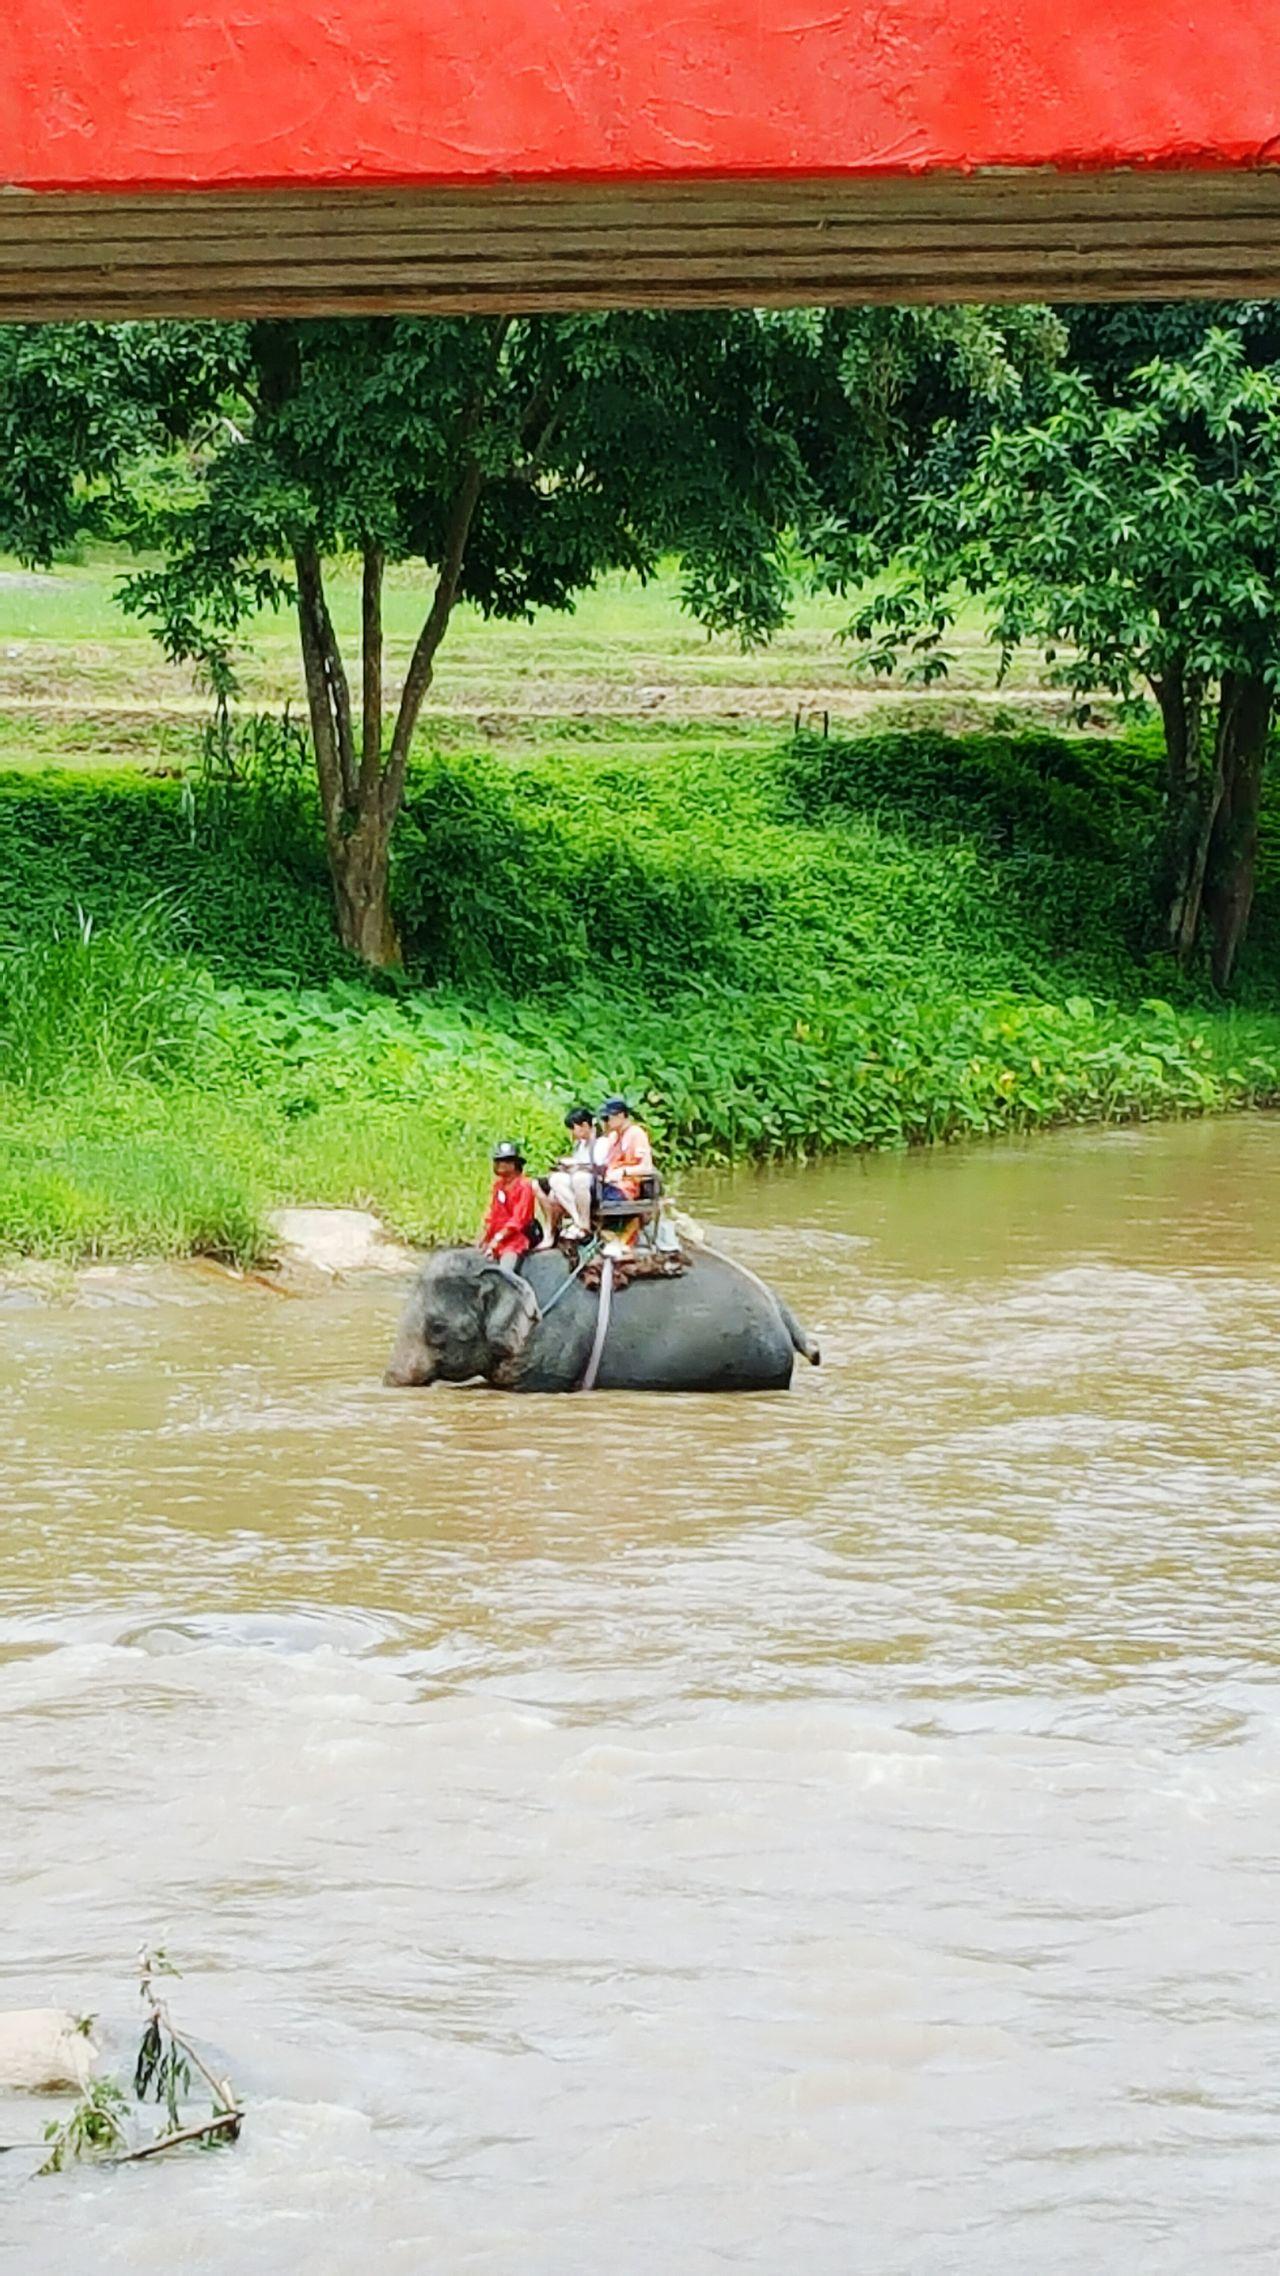 Forestwalk Elephant Chiang Mai | Thailand Asianstyle Travel On The Way Elephant Trekking On Elephant Back River